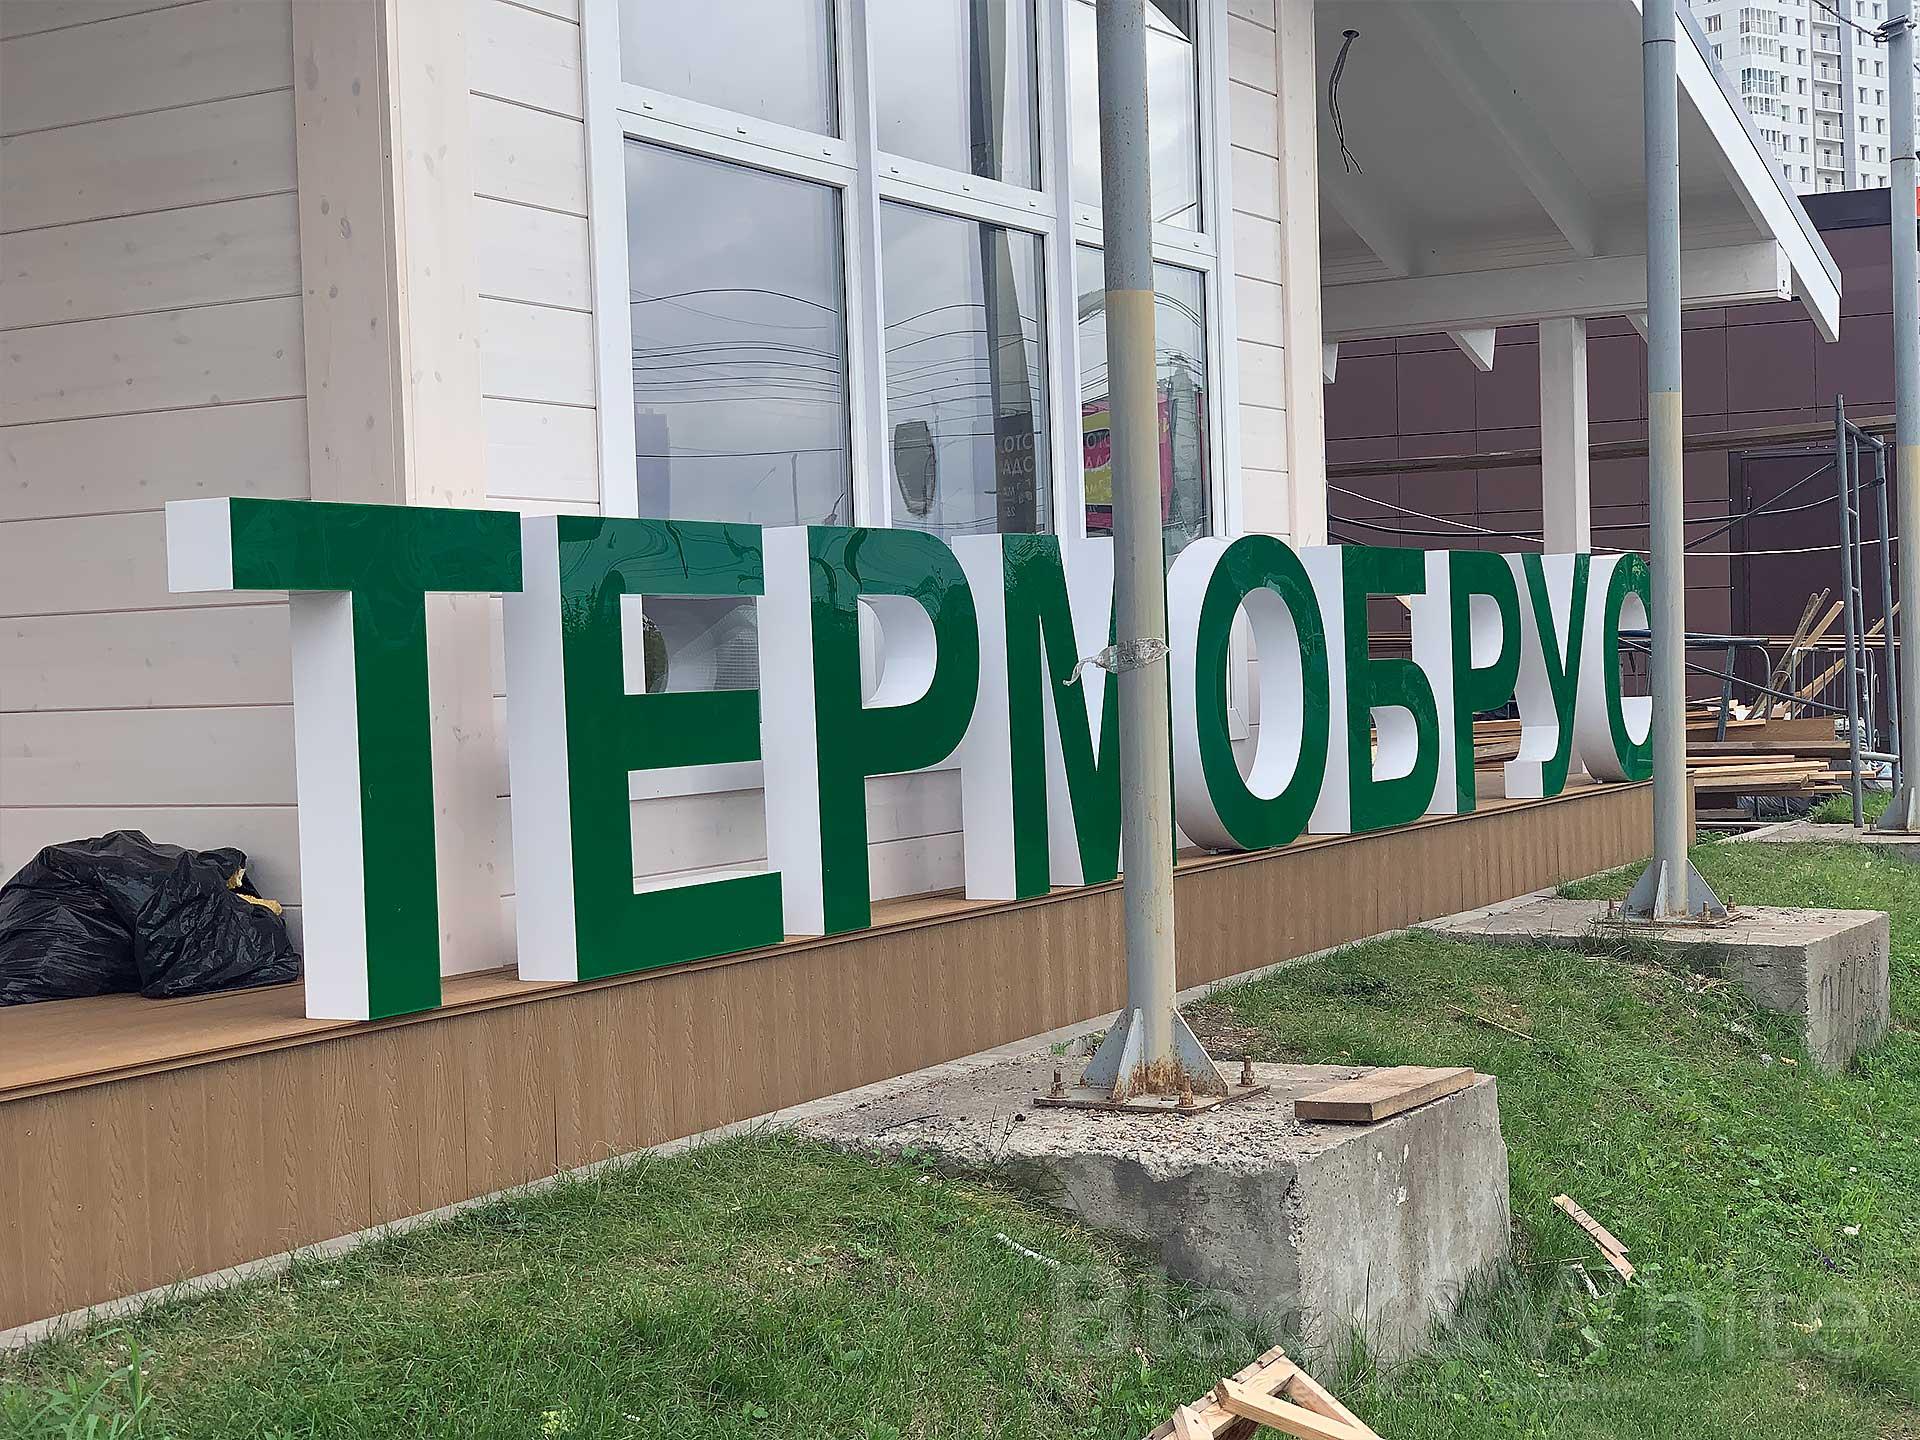 Напольные-световые-буквы-в-Красноярске.jpg